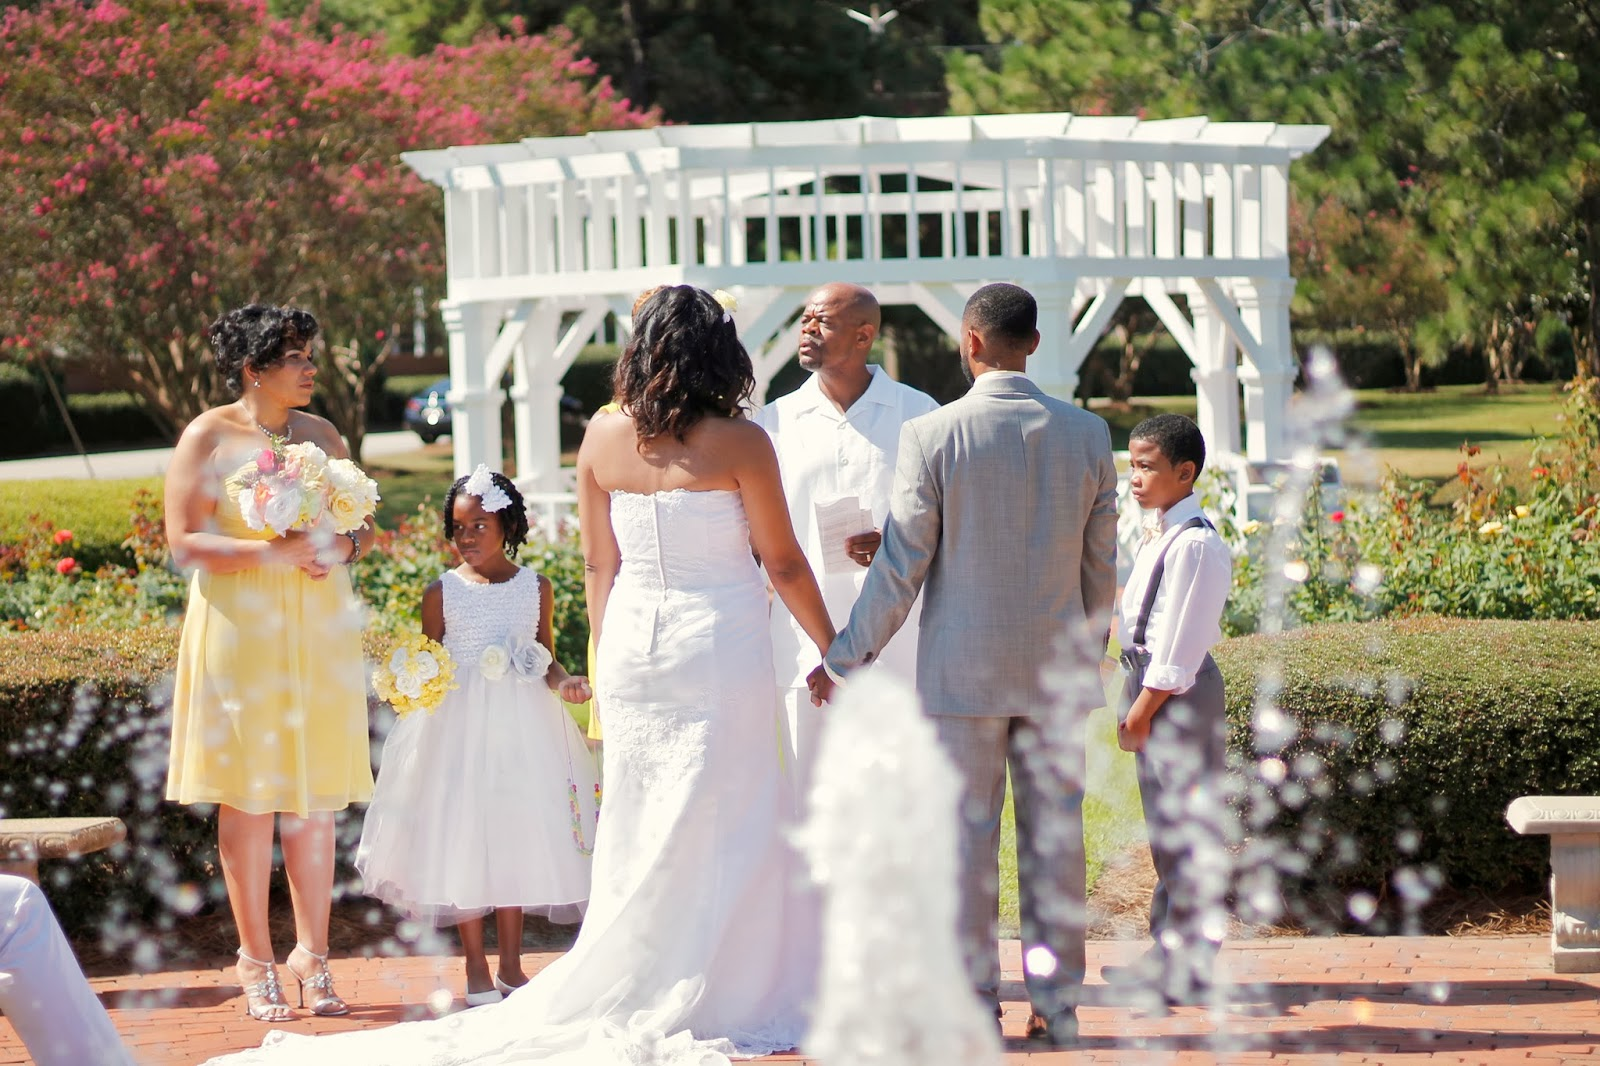 Small Backyard Wedding Doylestown Pa Wedding Photography: Southern Pines NC Wedding Photographer